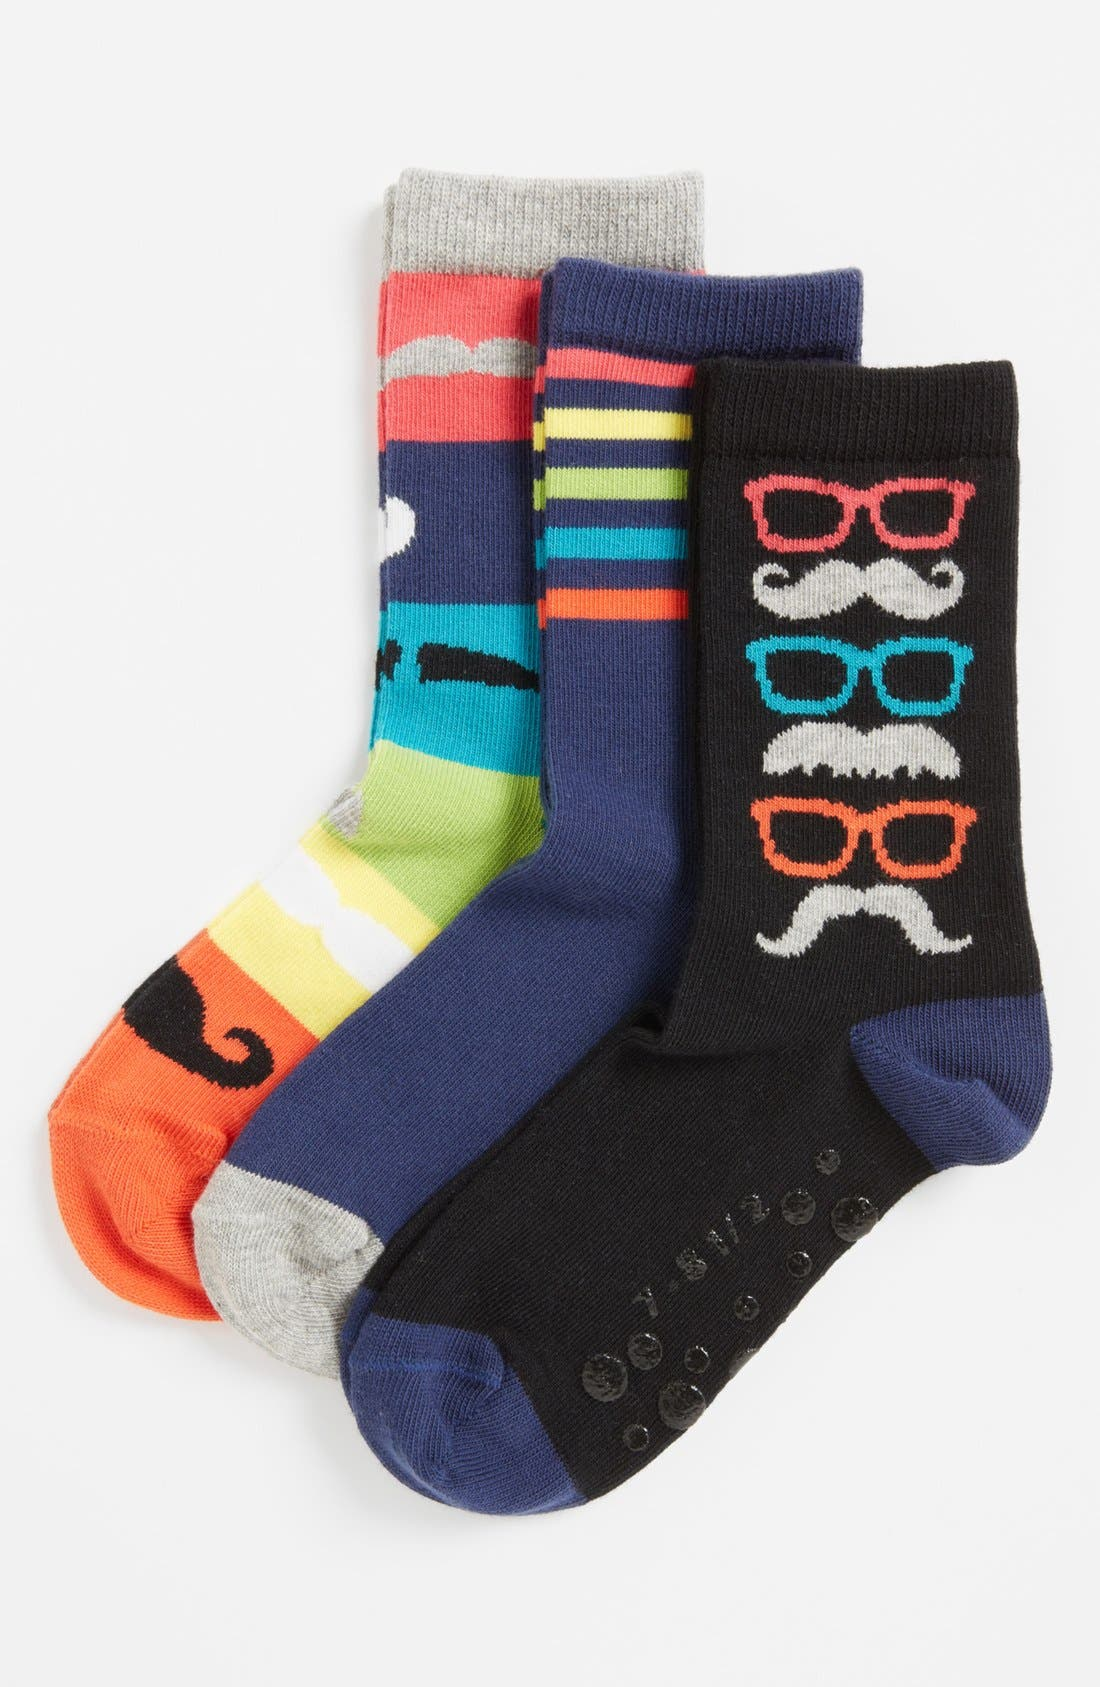 Alternate Image 1 Selected - Nordstrom 'Mustache Party' Socks (3-Pack) (Kids)